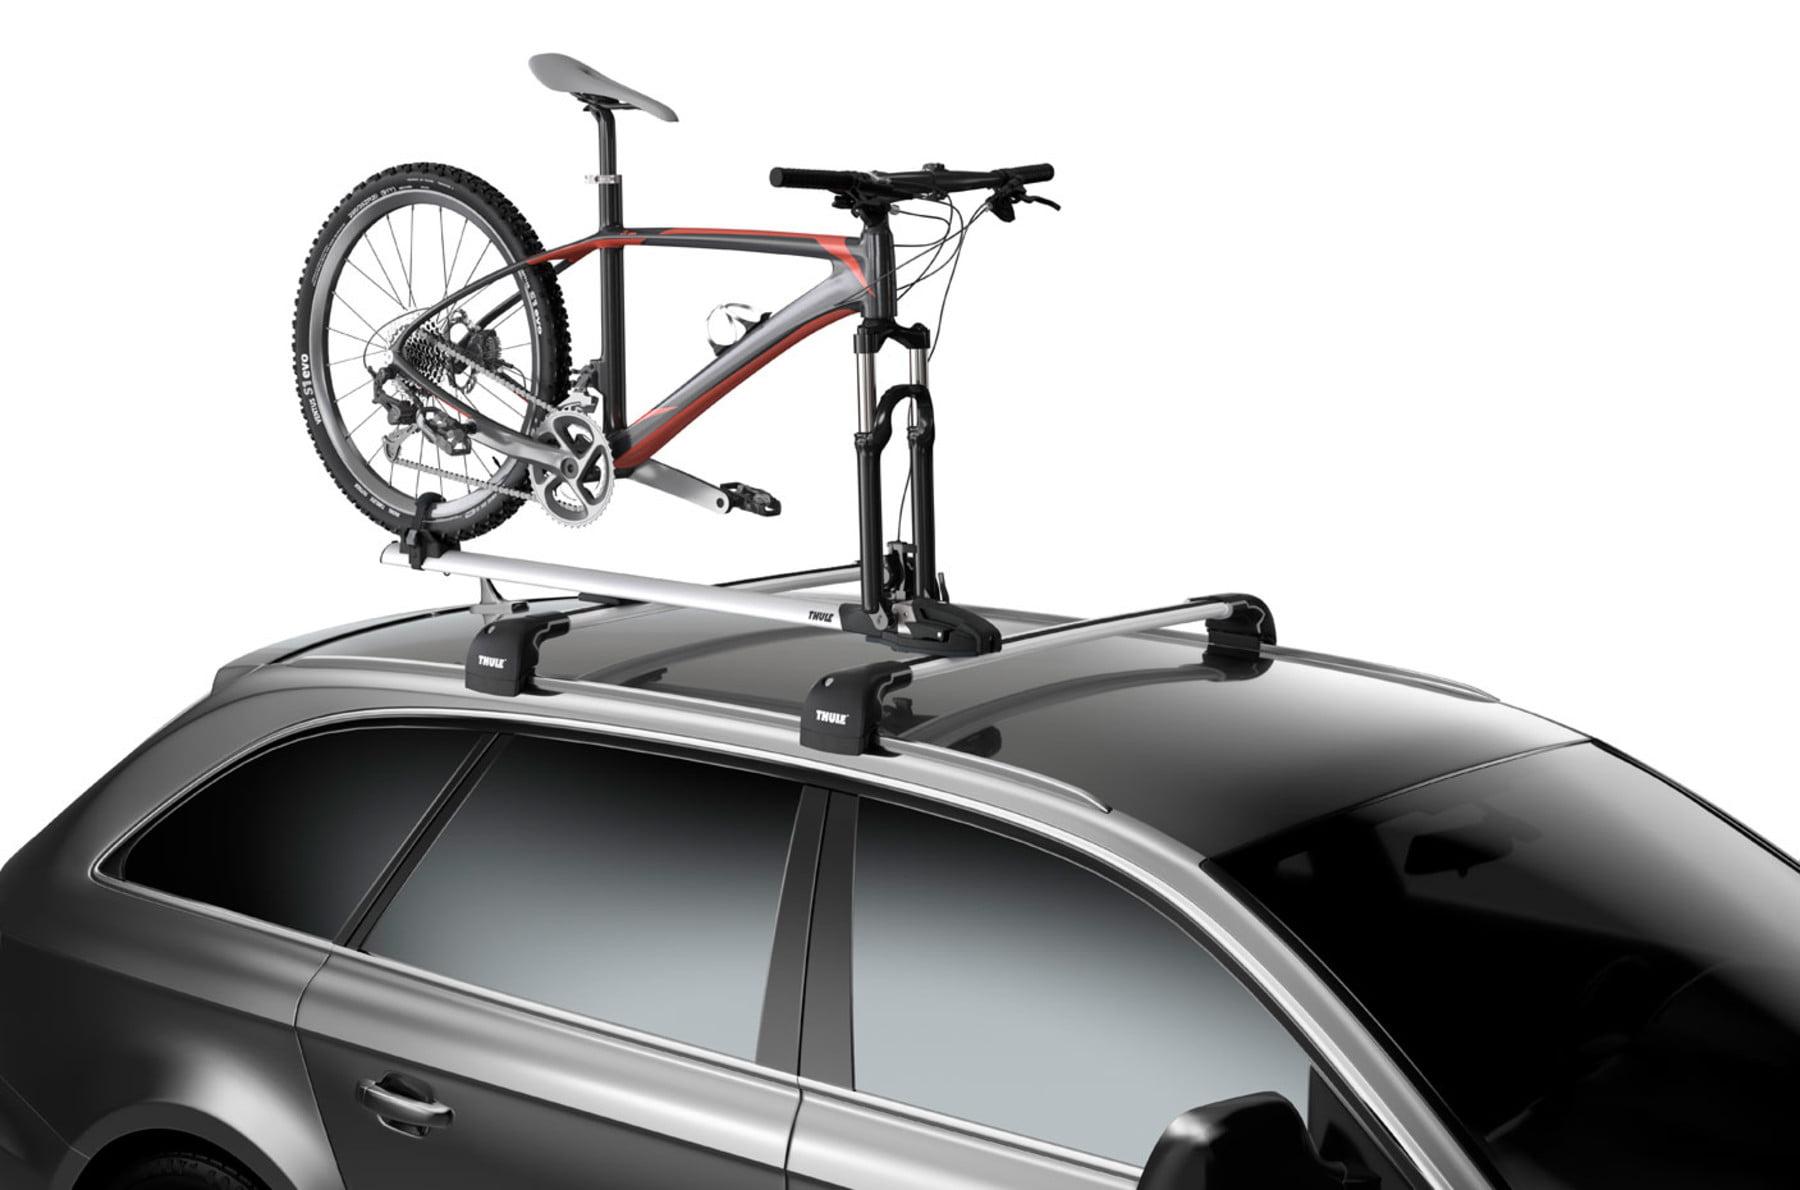 Suport biciclete Thule ThruRide 565 cu prindere pe bare transversale 2